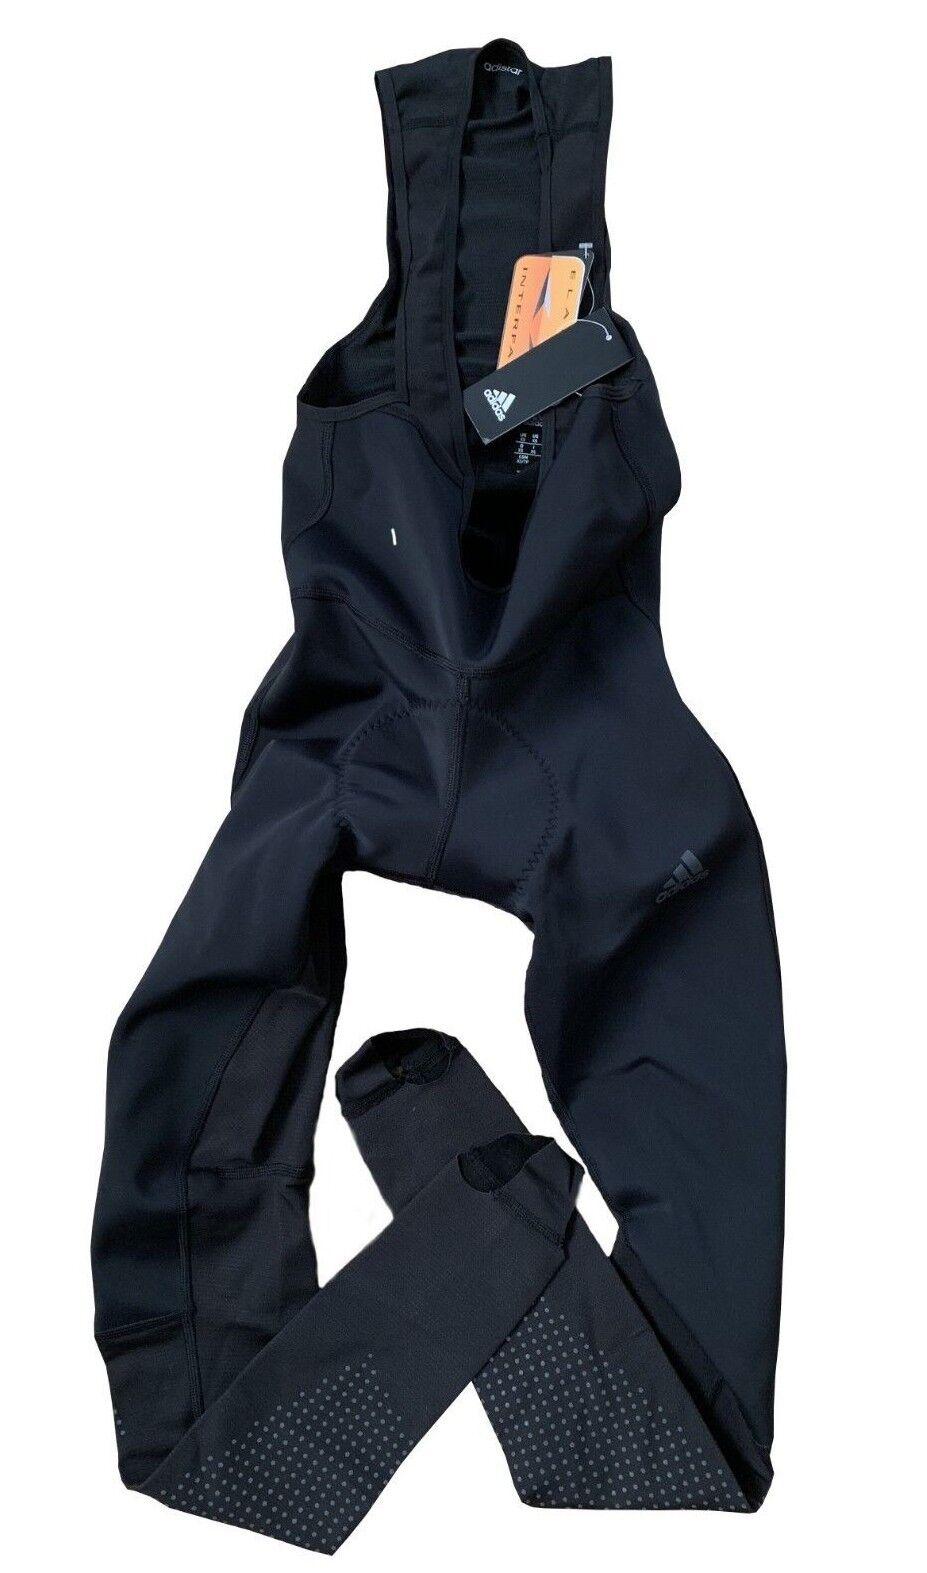 Adidas Bike Pantalon trägerhose Lang Bibcourtes courte nouveau coussin XS S XL XXL